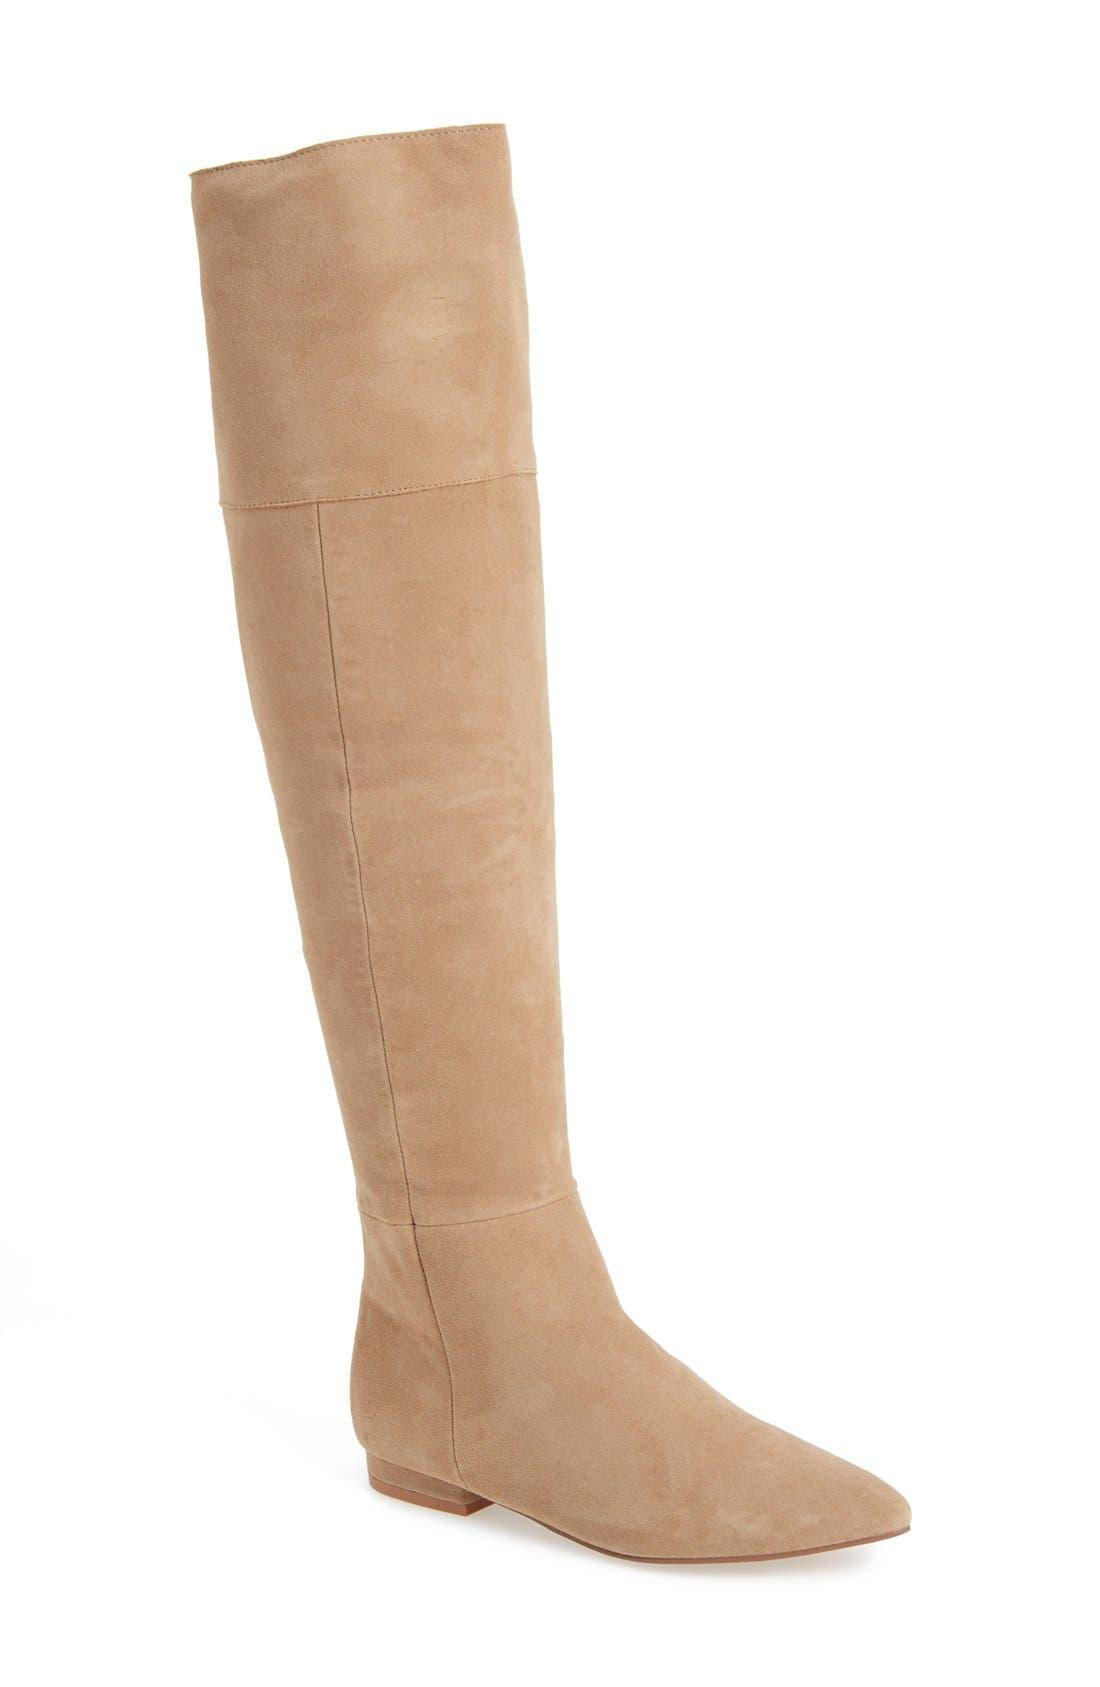 KRISTIN CAVALLARI 'York' Over the Knee Boot